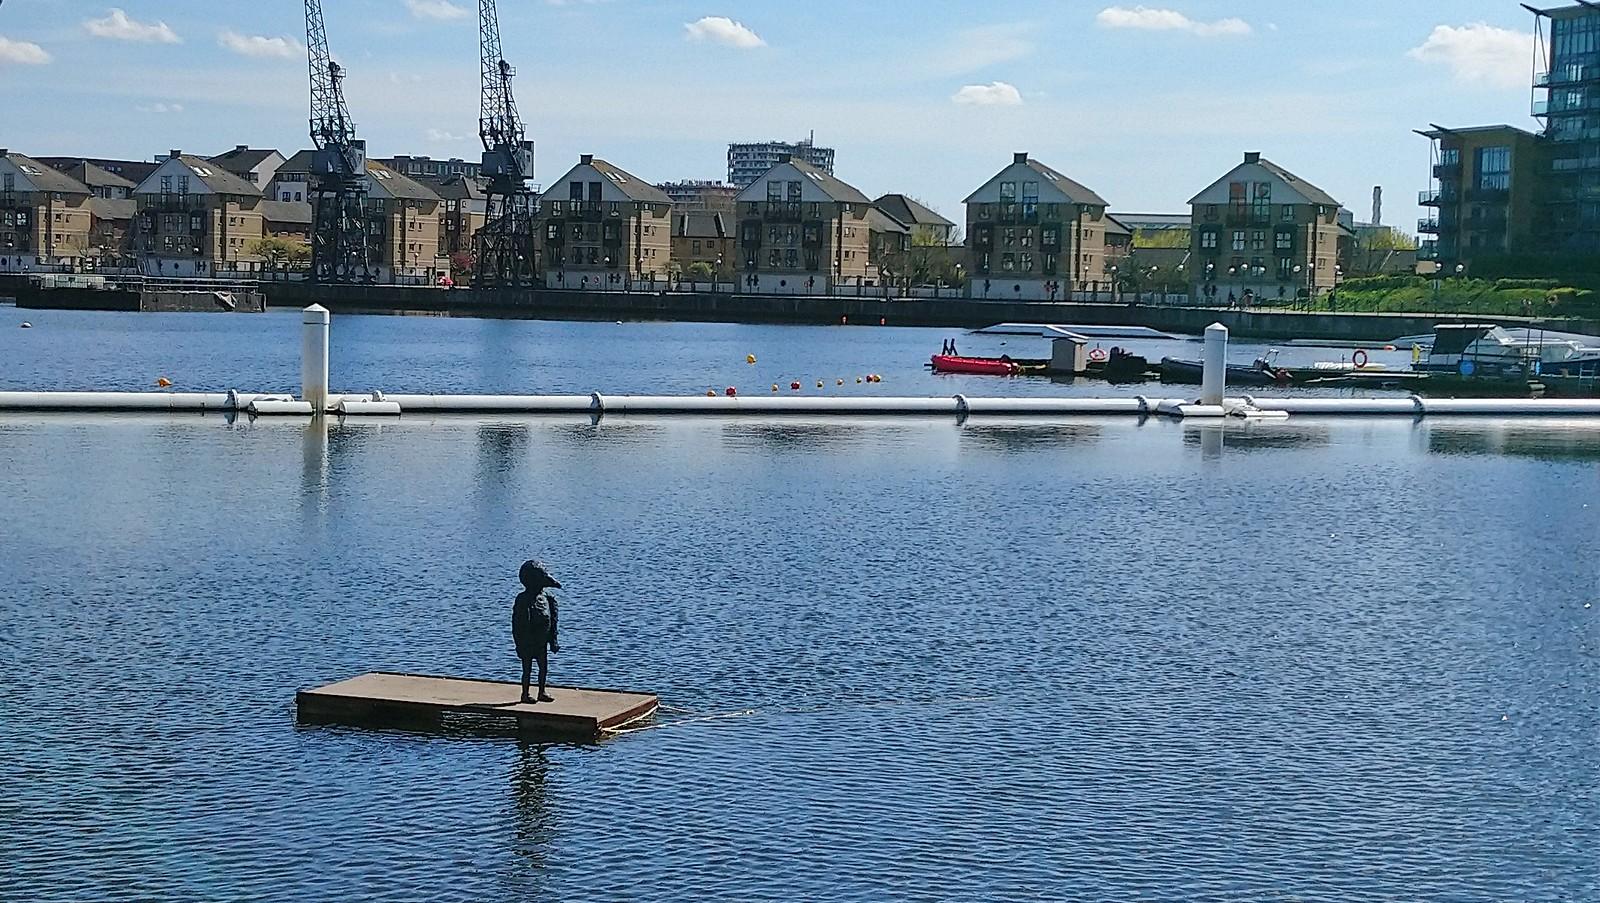 Laura Ford - Bird Boy, at Royal Victoria Docks SWC Short Walk 21 - The Line Modern Art Walk (Stratford to North Greenwich)